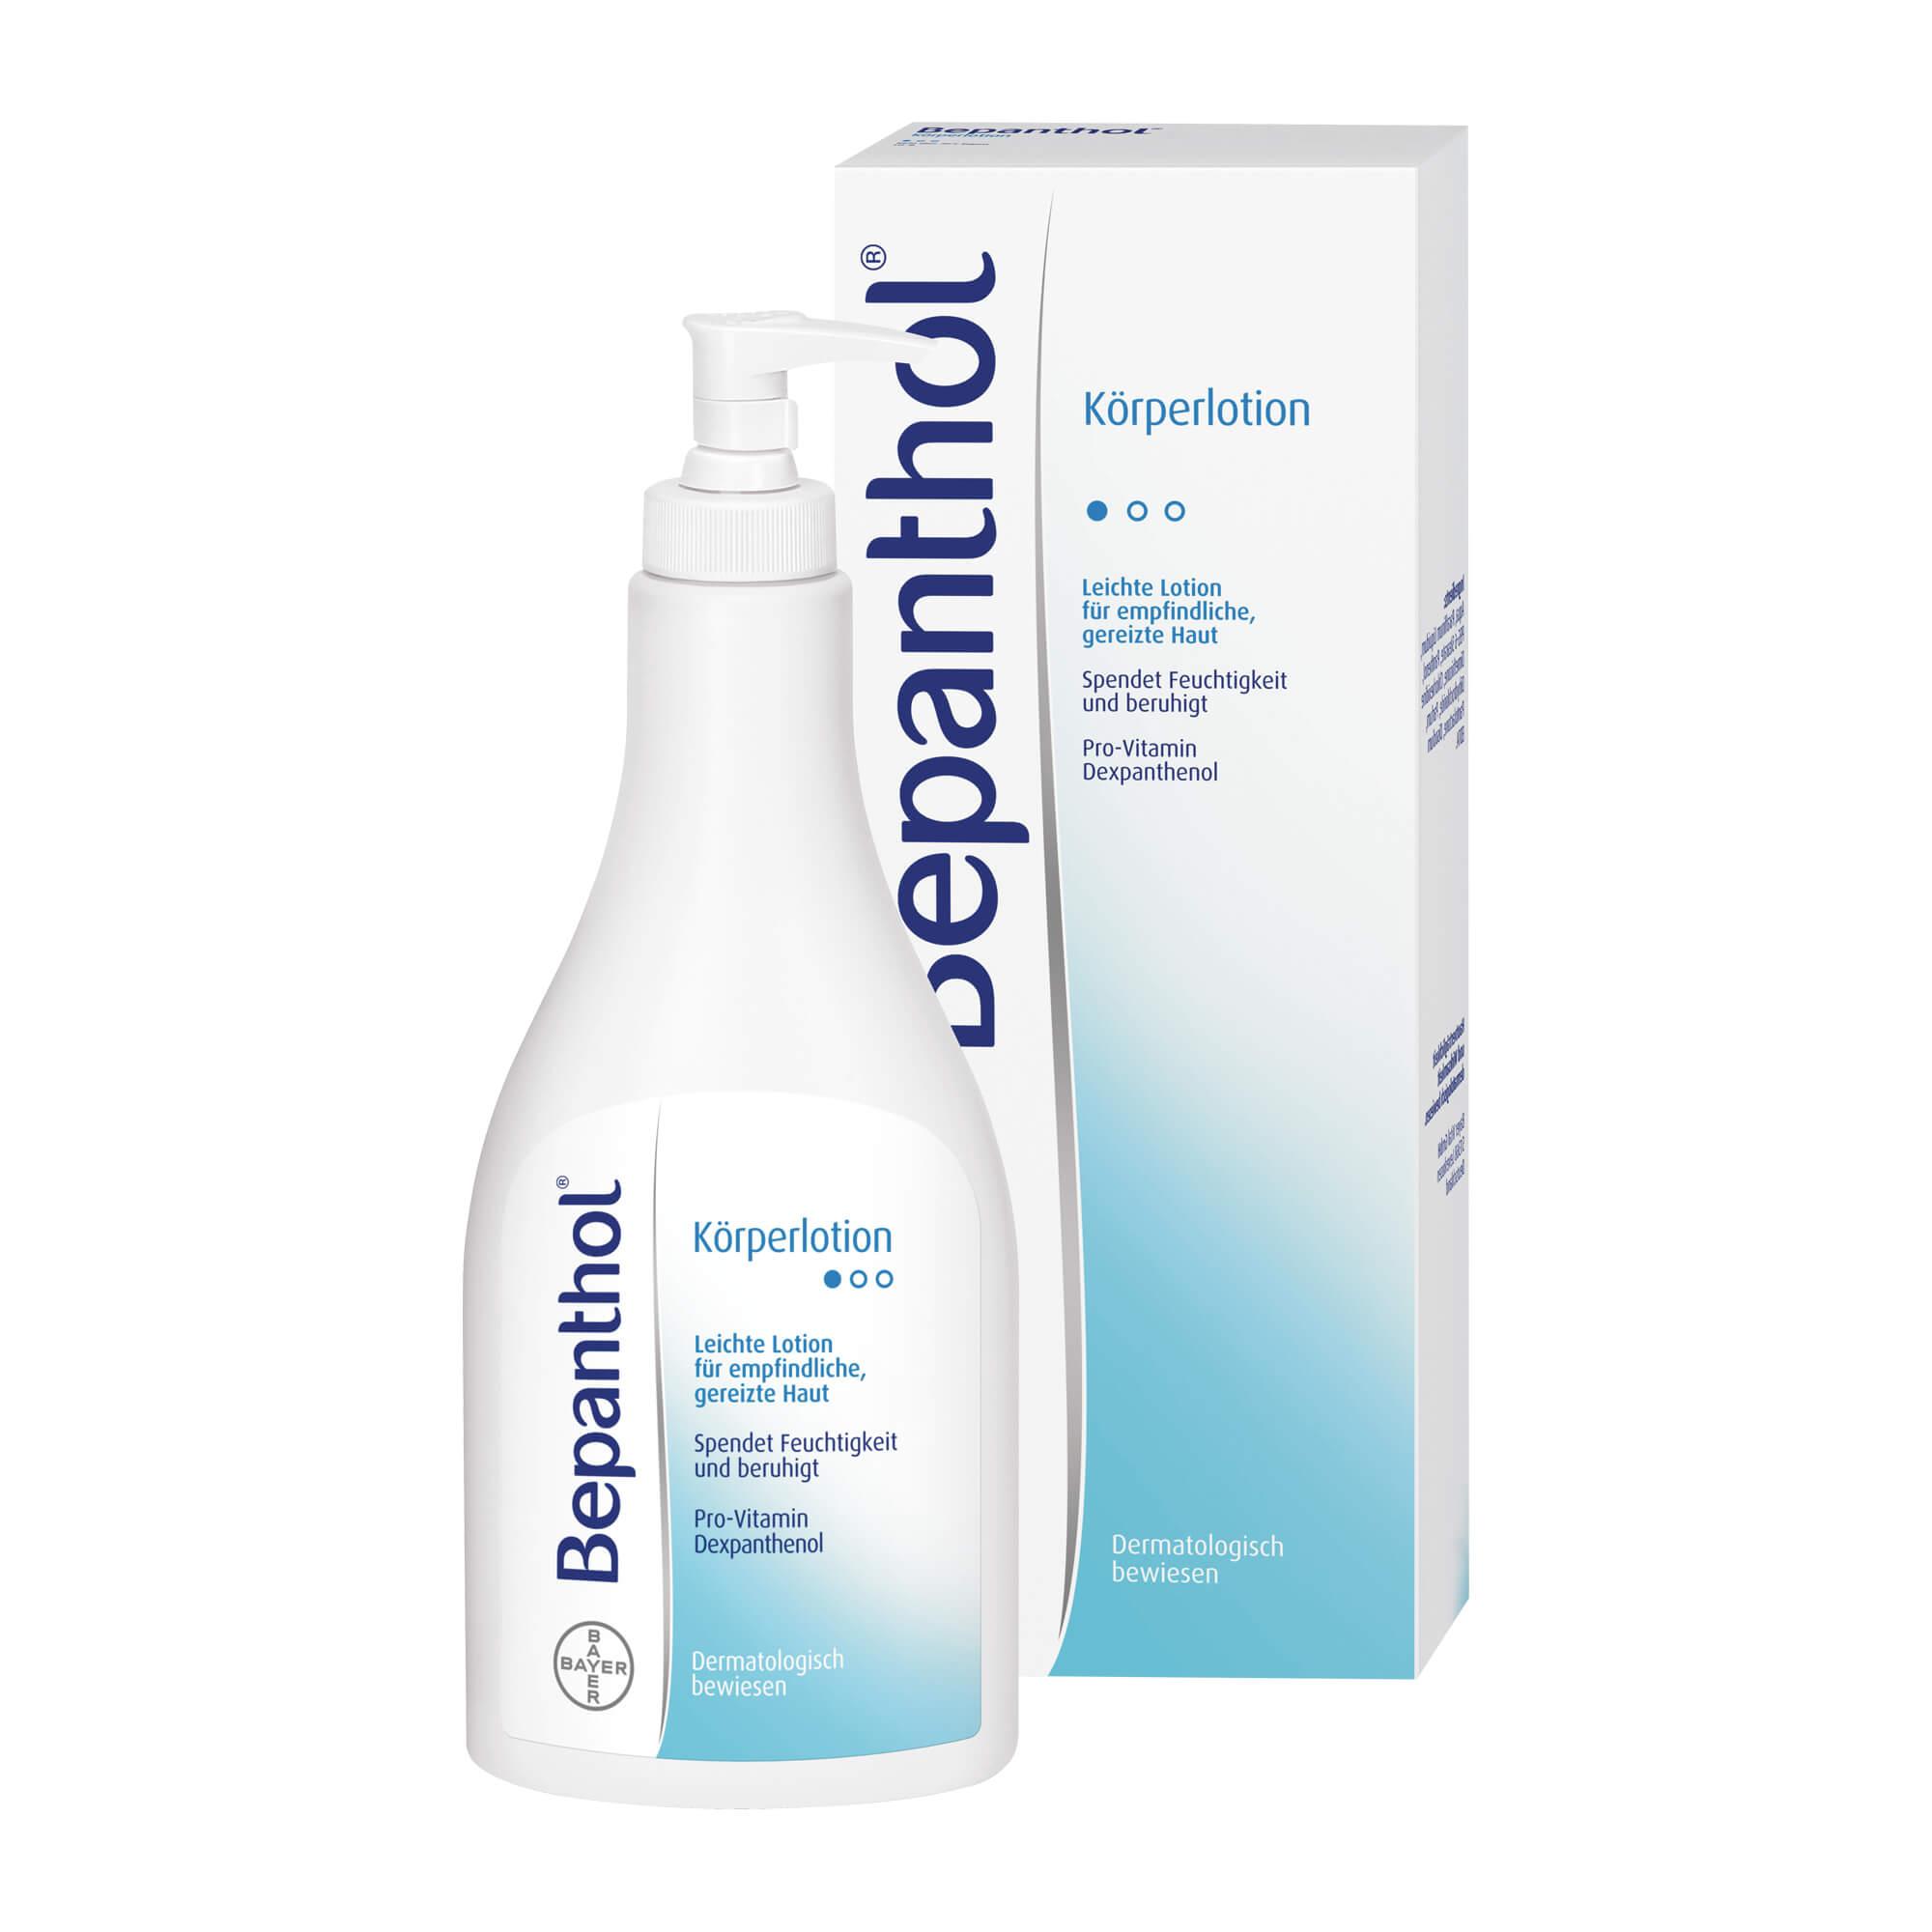 BEPANTHOL KOERPERLOTION SP, 400 ml | Arzneimittel-Datenbank